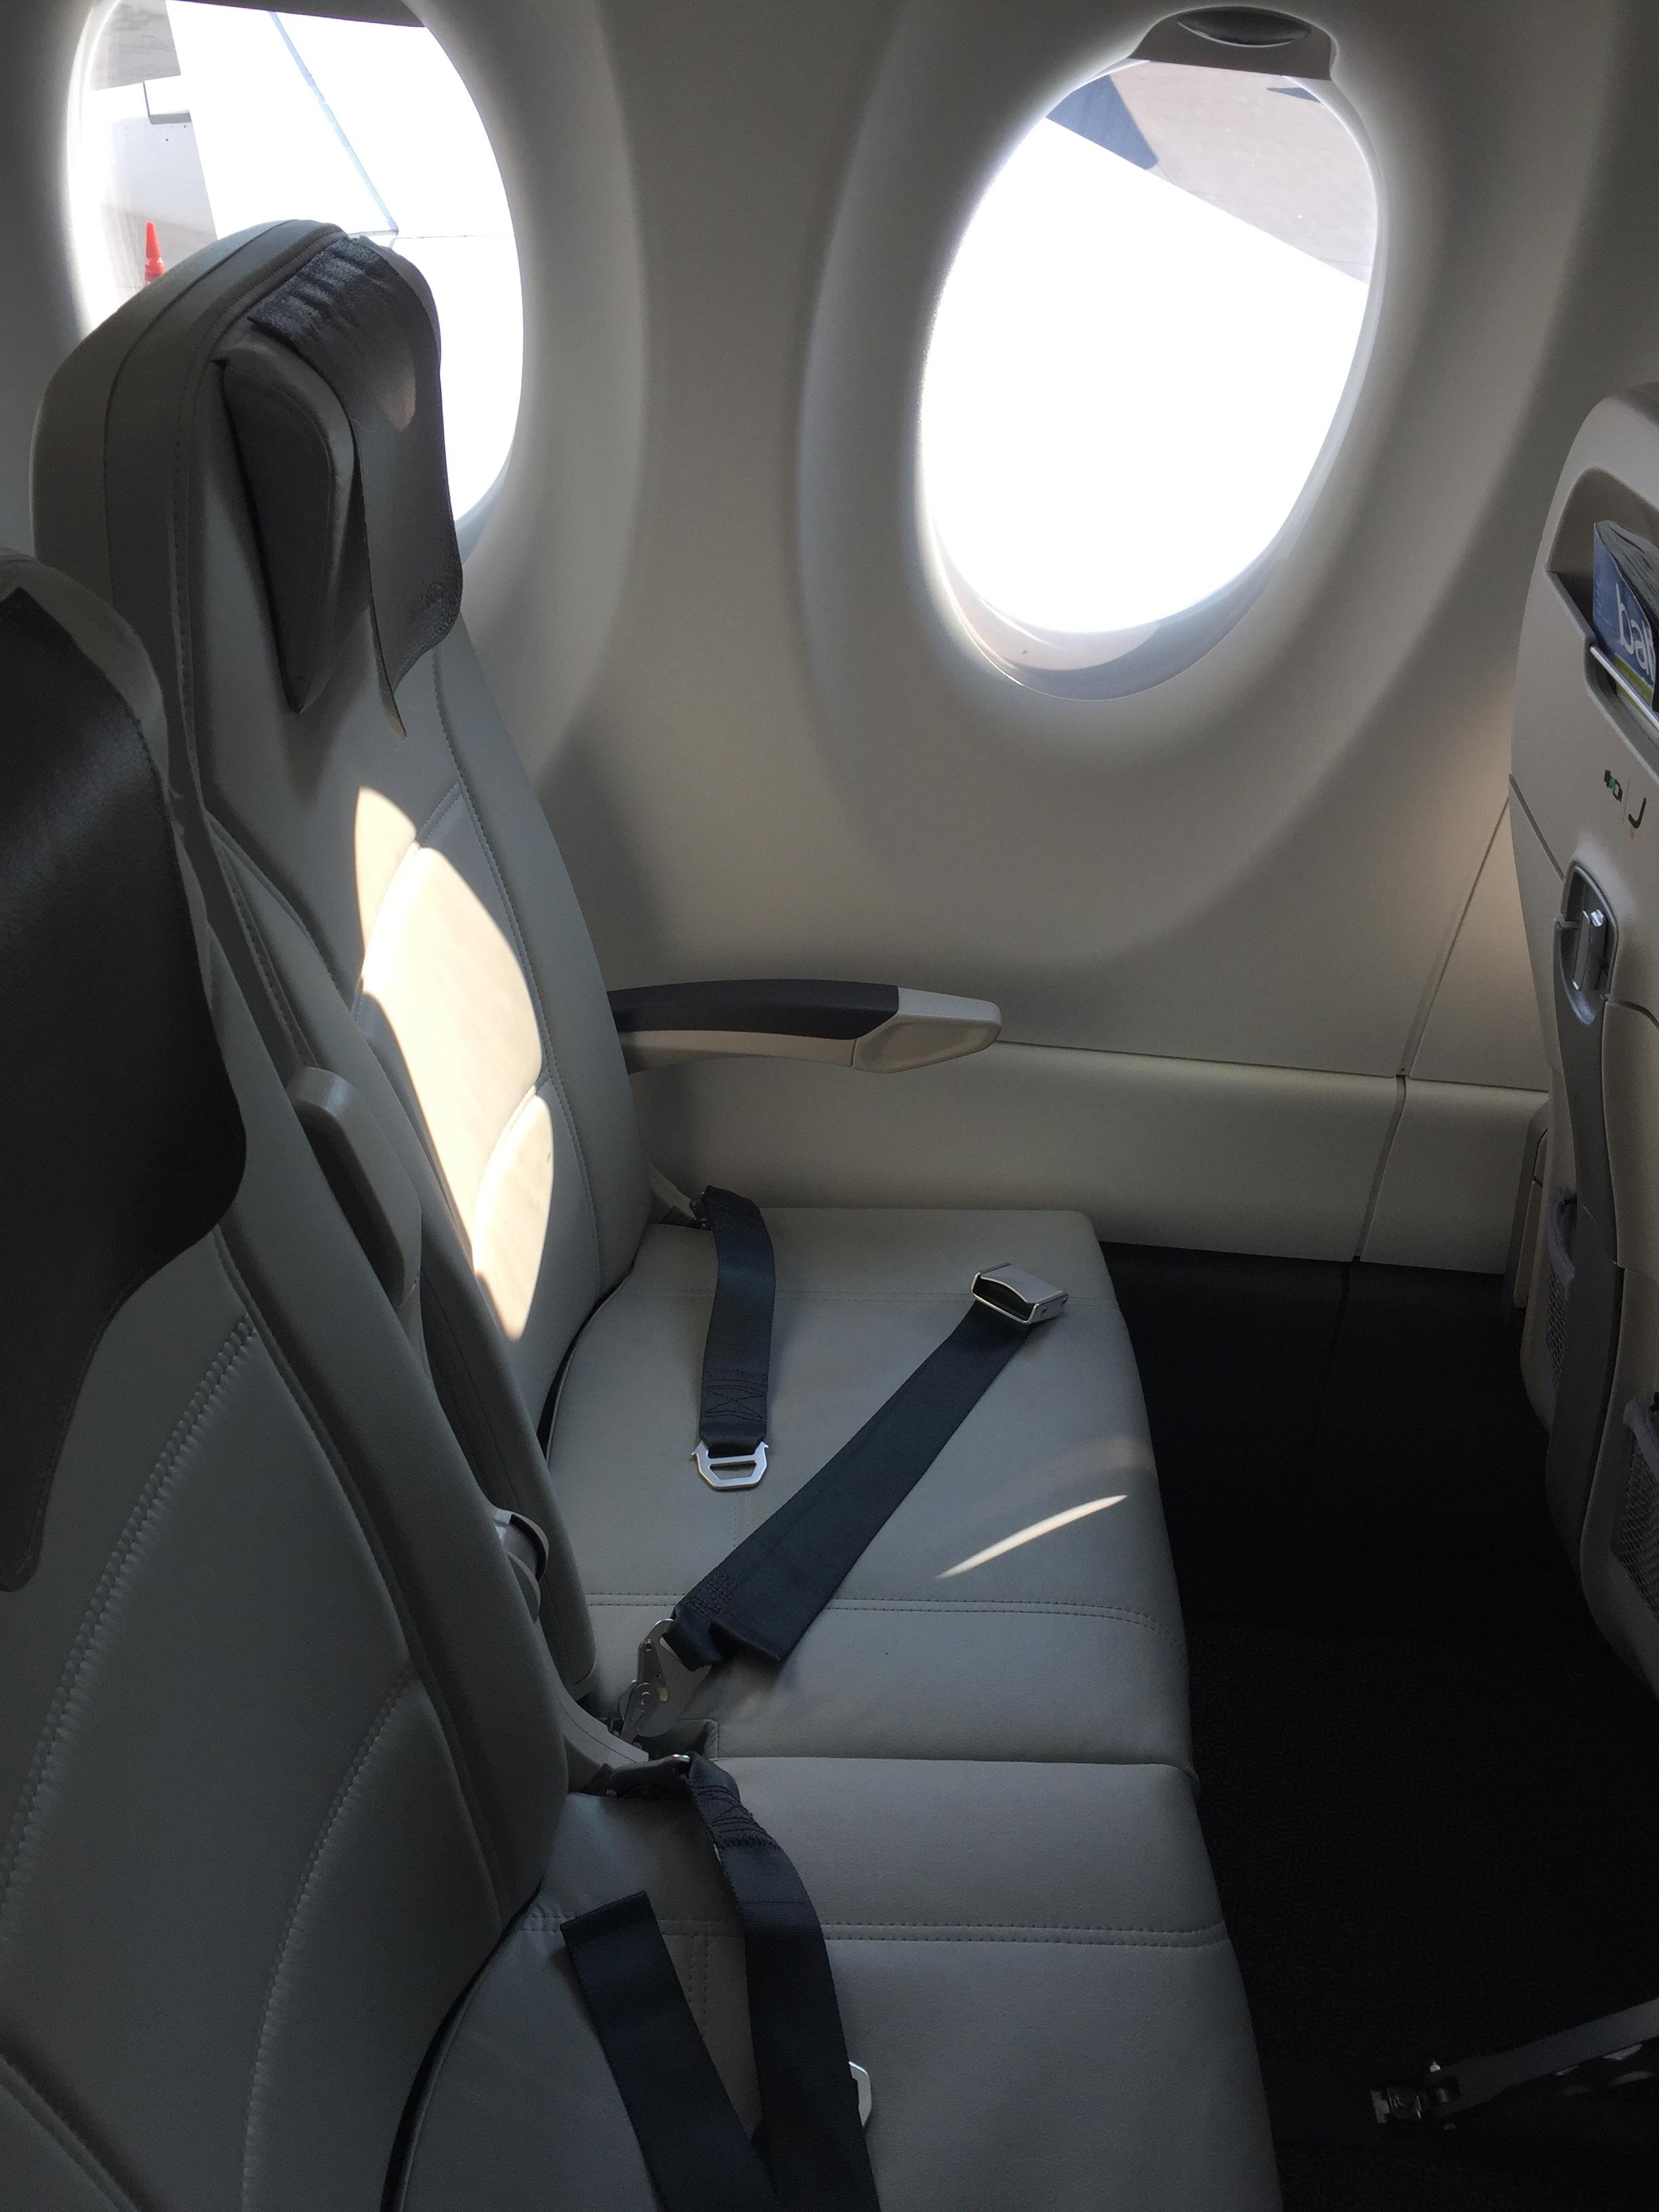 airbaltic economy cabin.JPG